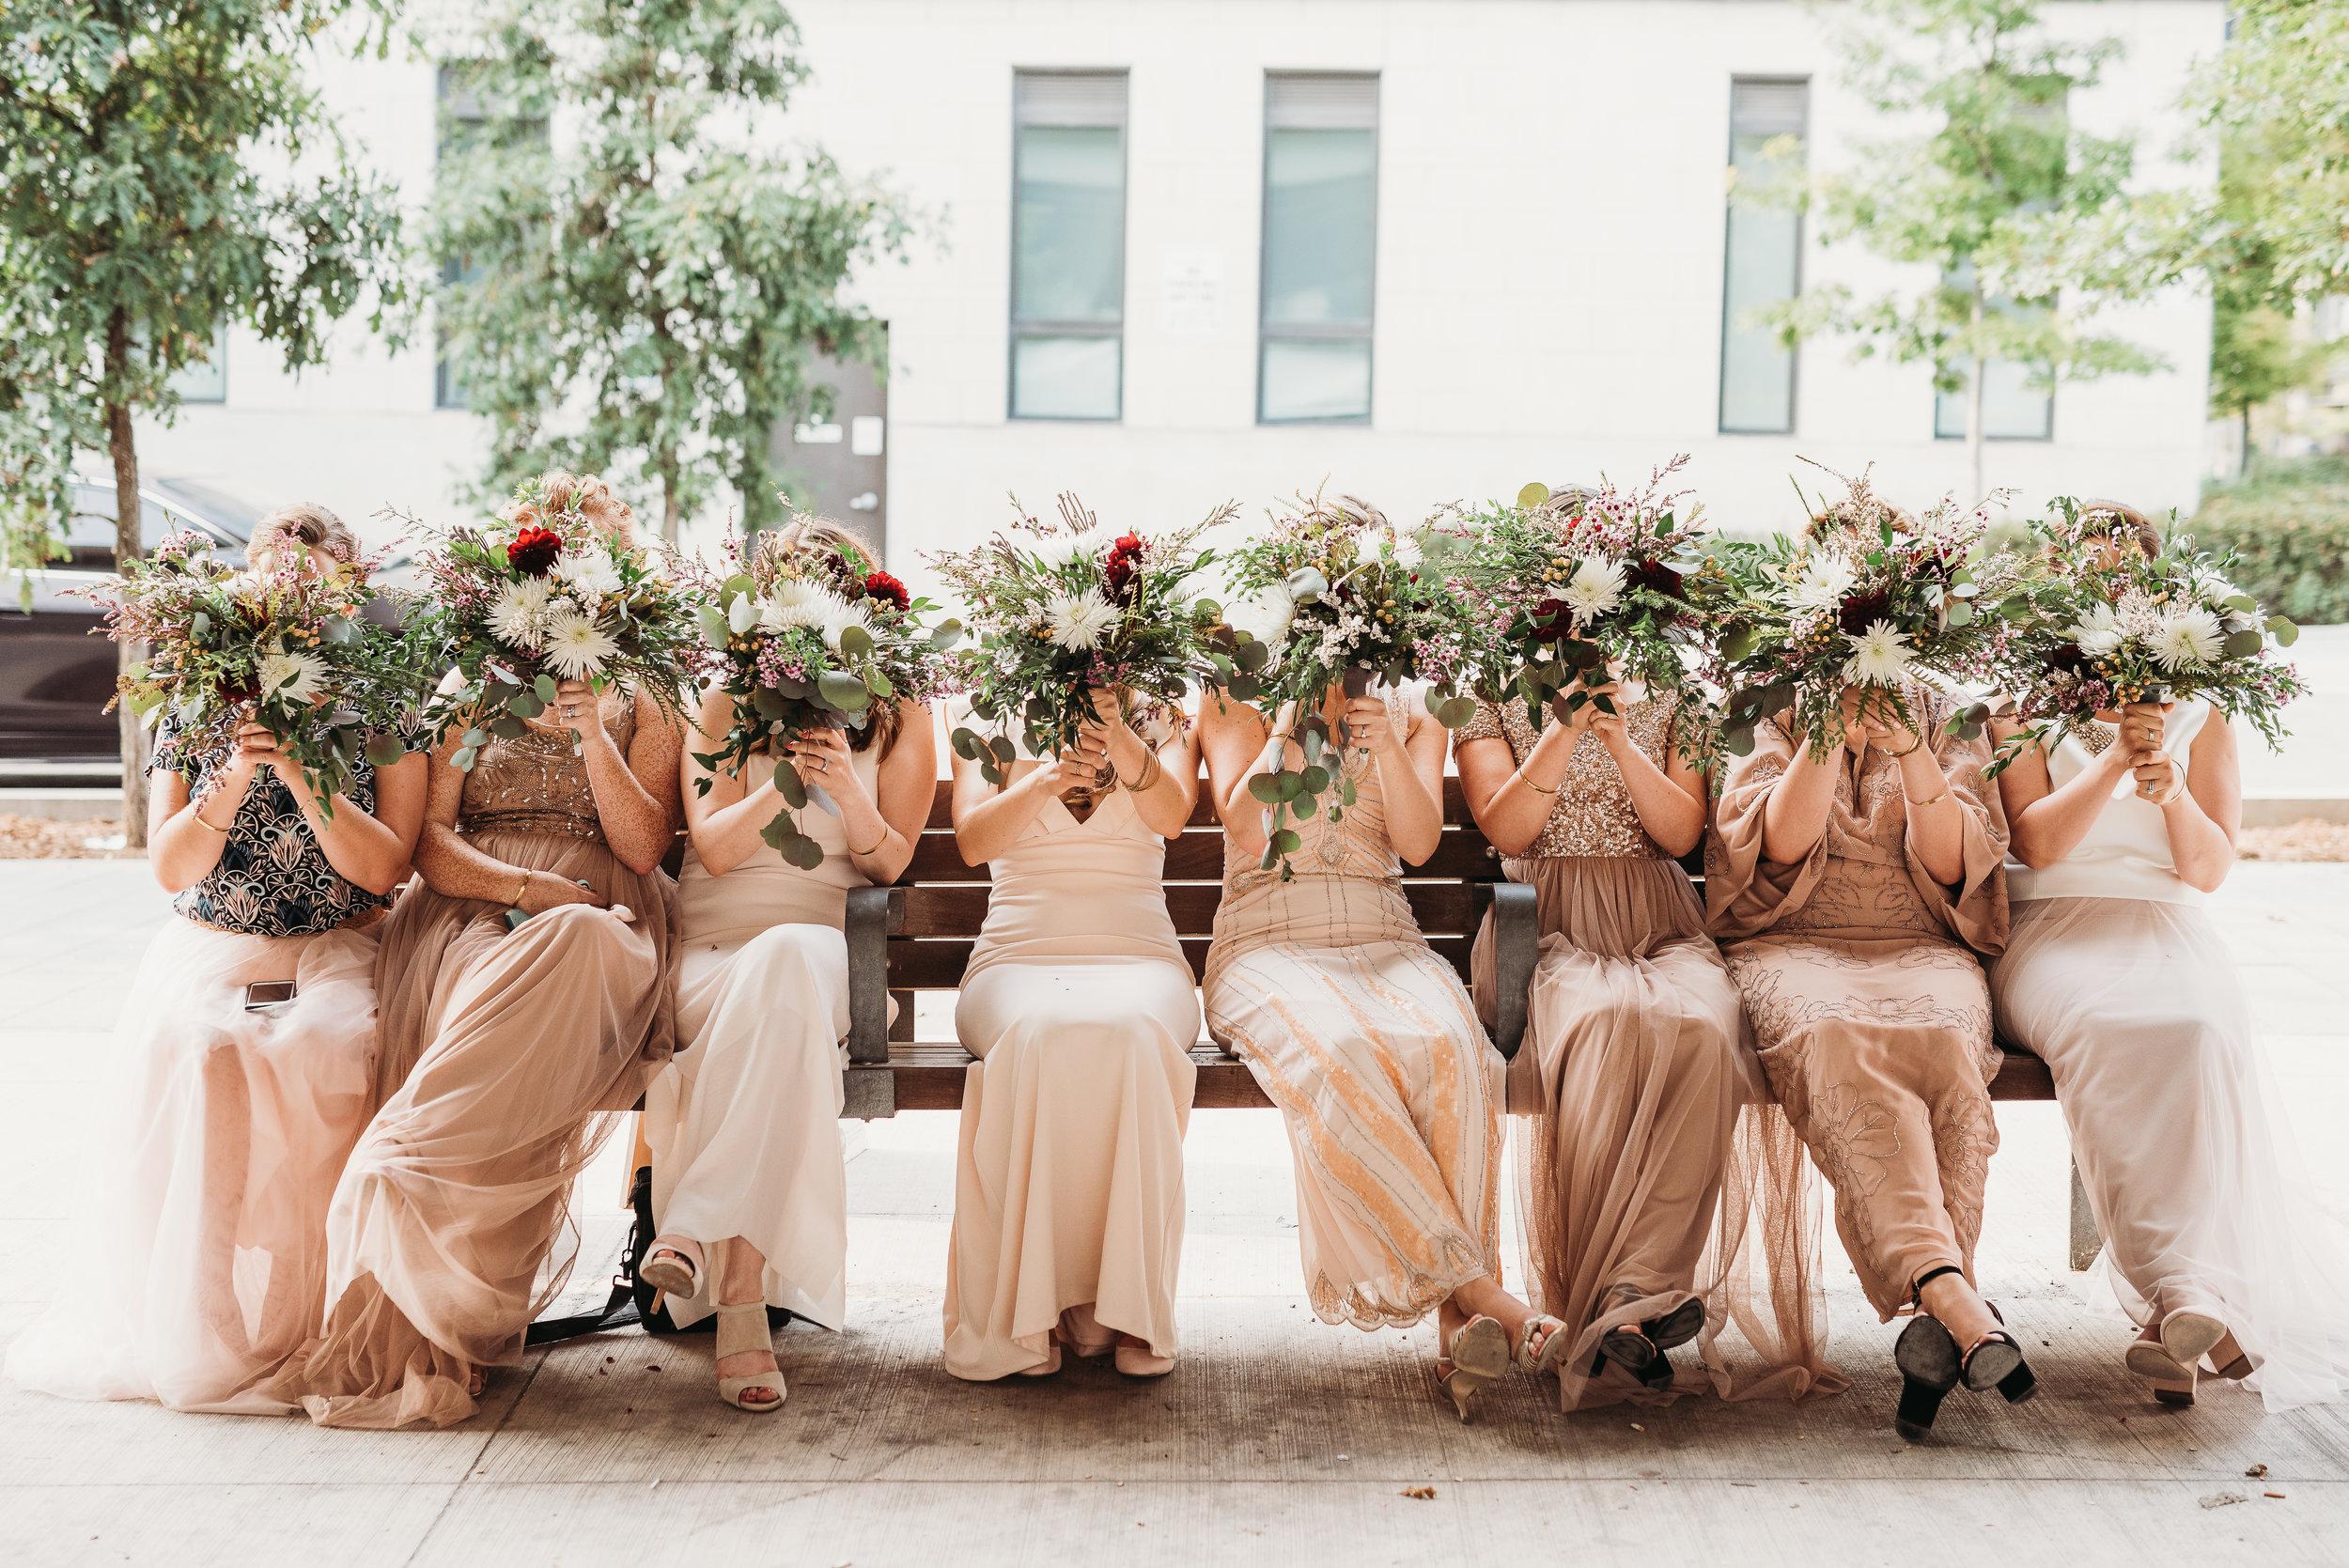 fun-bridal-party-bouquet-picture-toronto-rustic-boho-airship37-wedding-by-willow-birch-photo-toronto-documentary-wedding-photographers.jpg